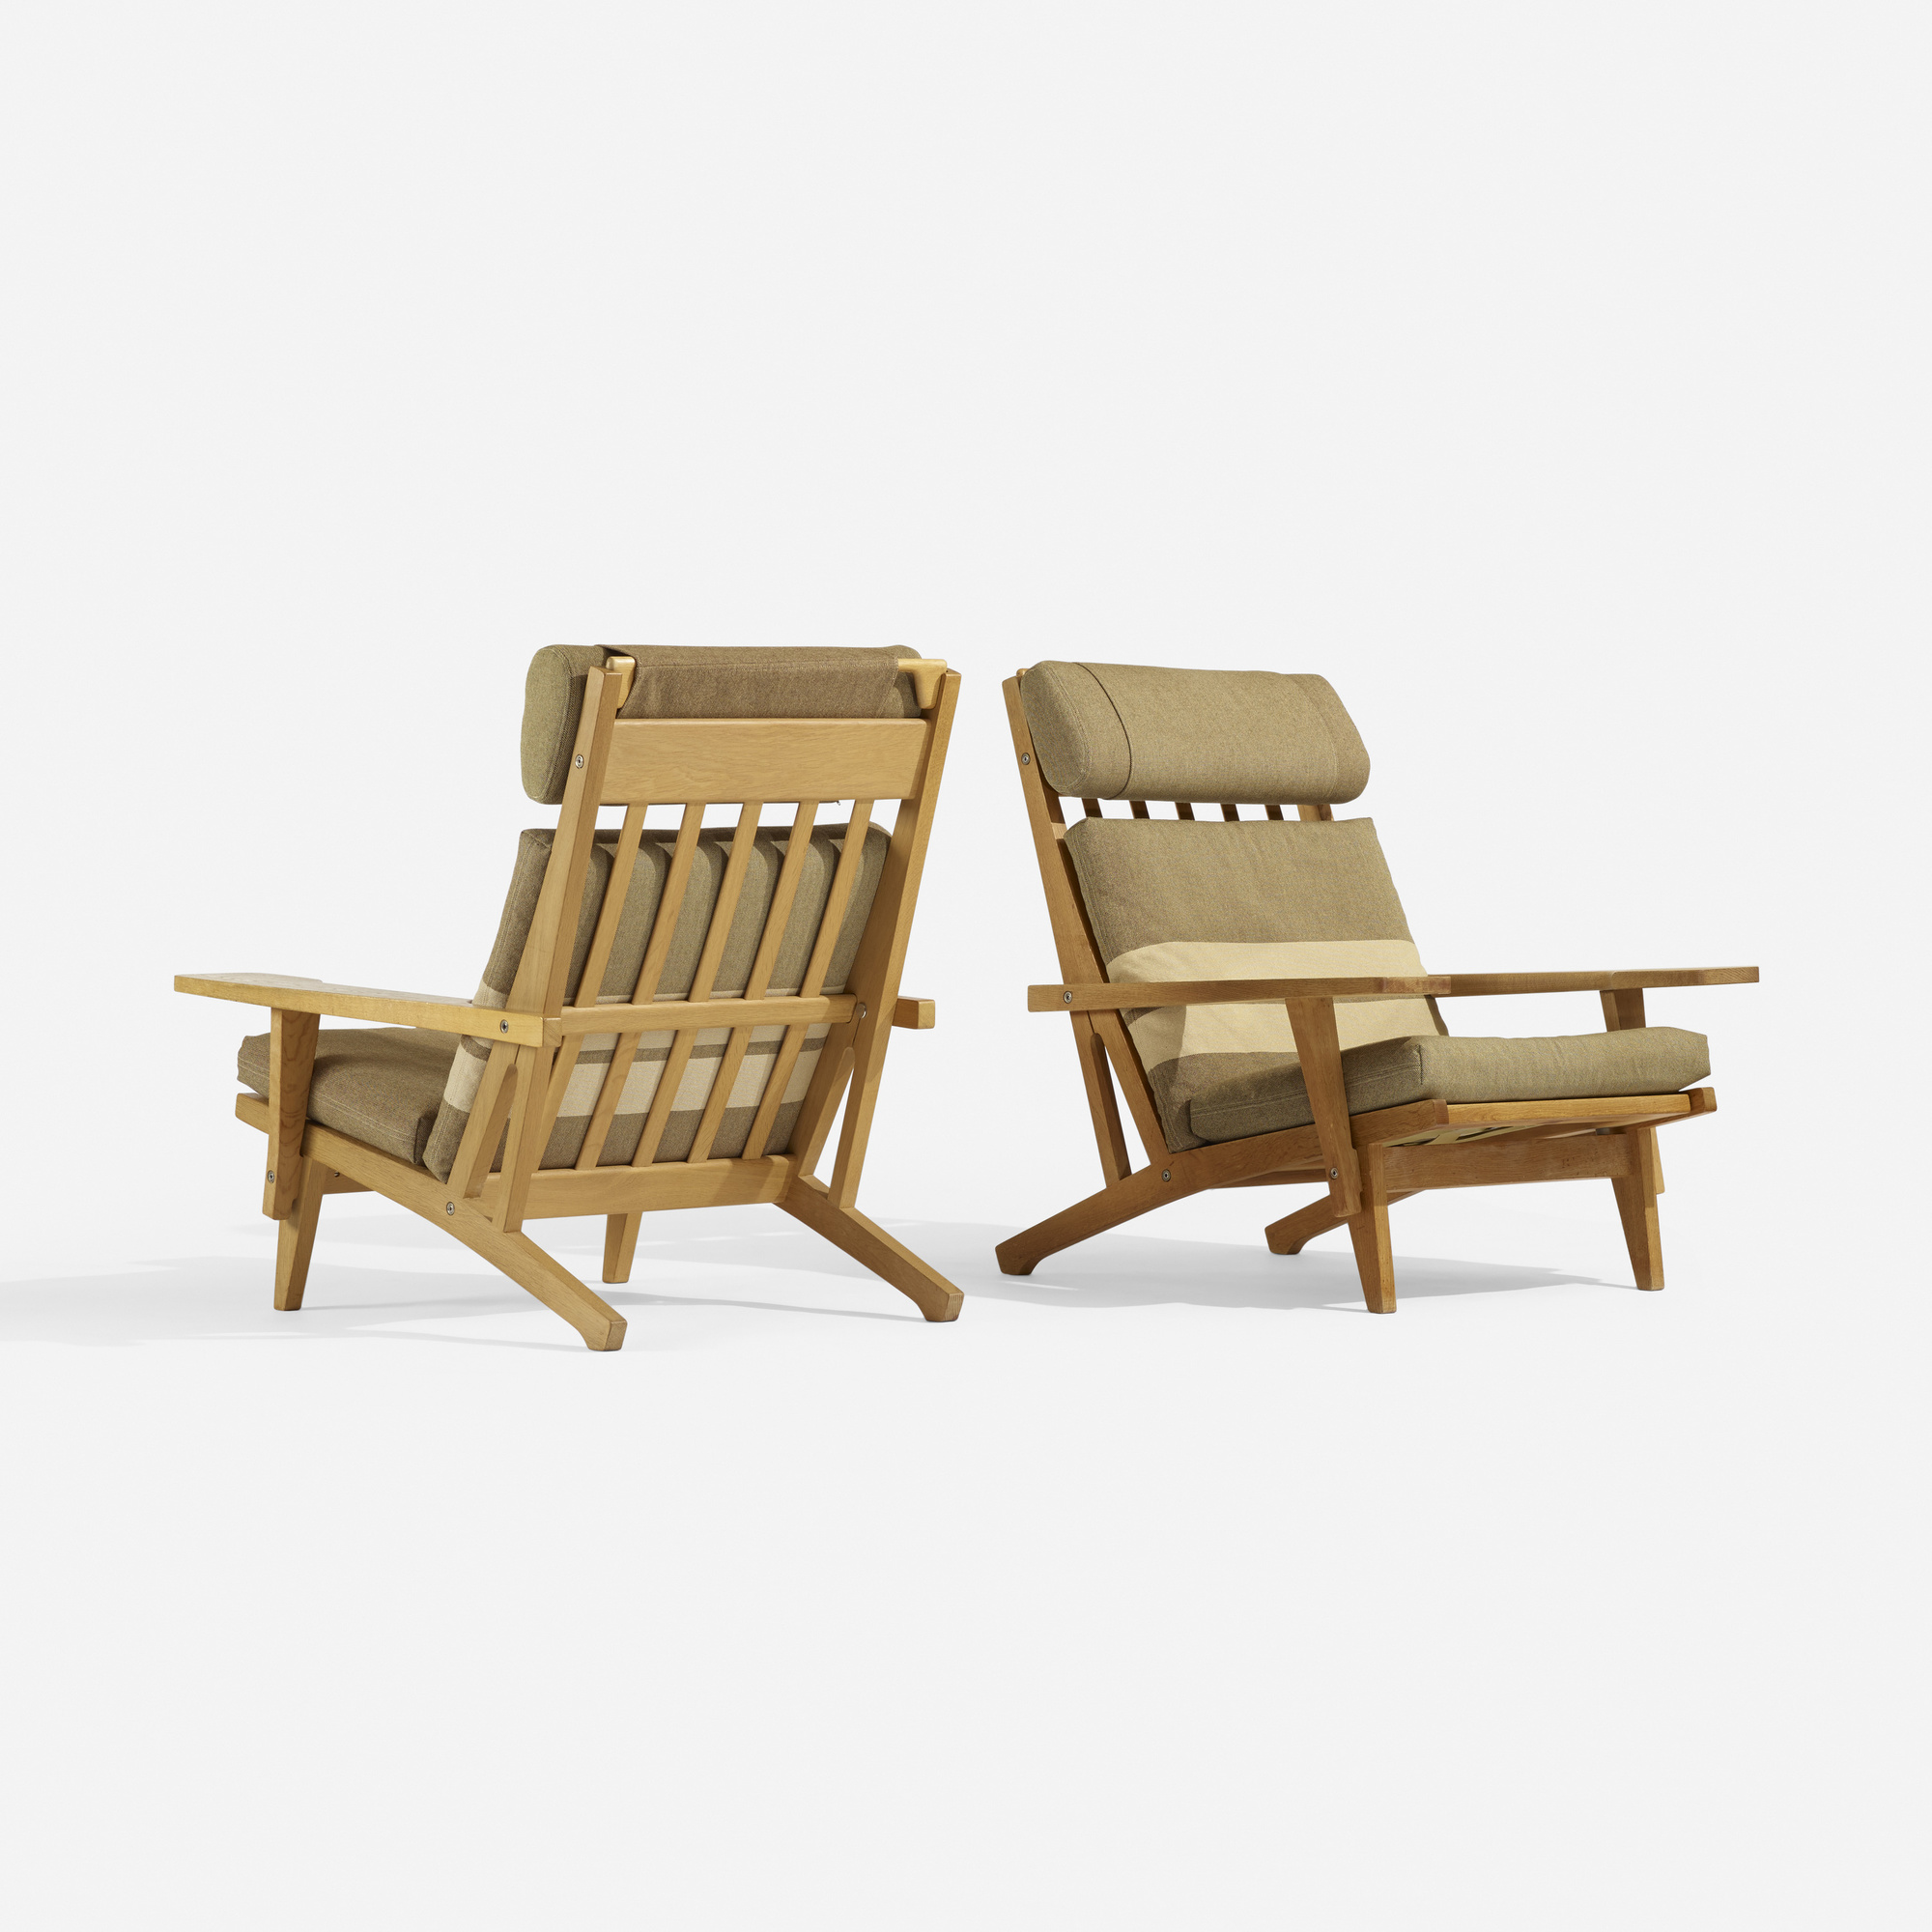 288: Hans J. Wegner / lounge chairs model GE375, pair (1 of 4)